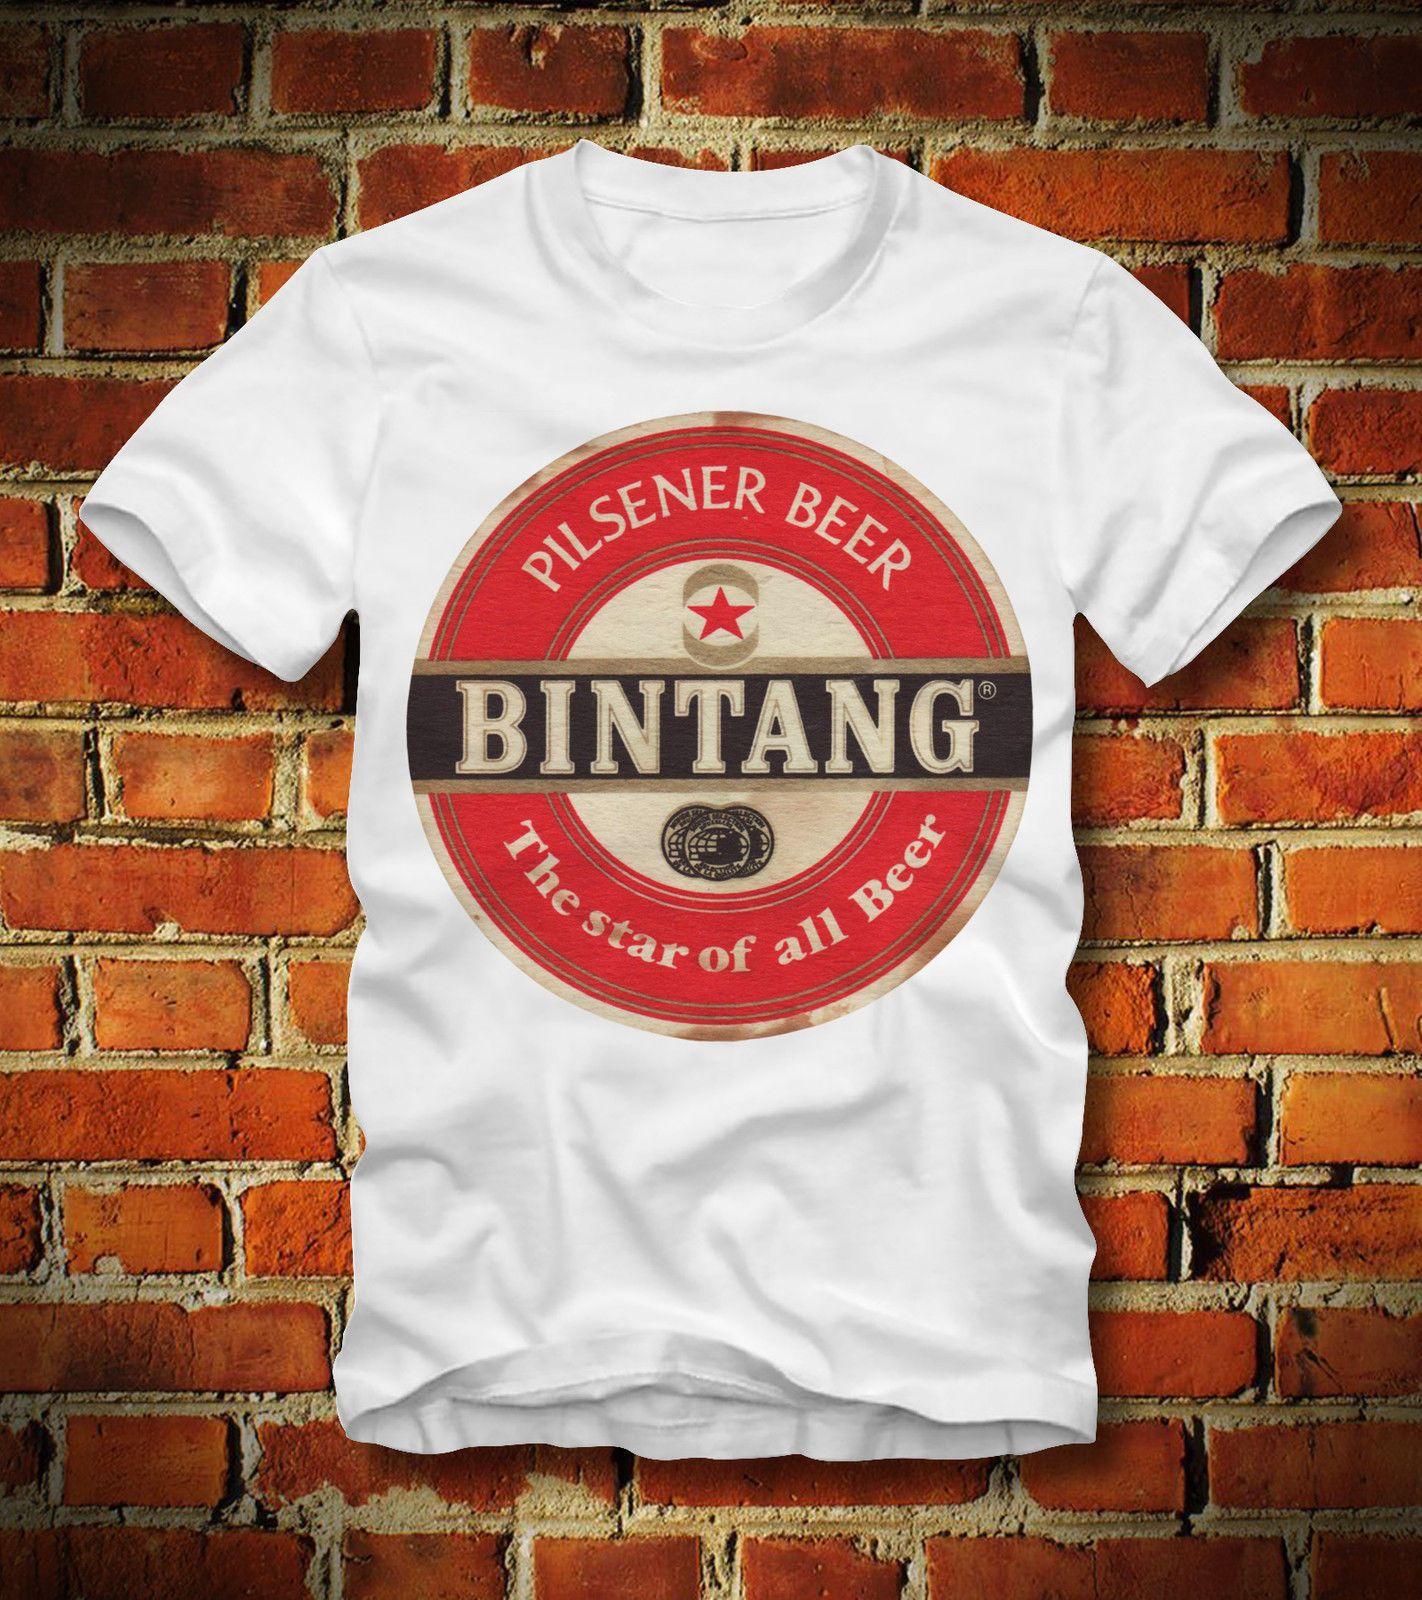 T-SHIRT Bintang PILSENER INDONÉSIE JAKARTA NATIONAL RETRO LOOKCool fierté Casual Mode unisexe t-shirt Livraison gratuite